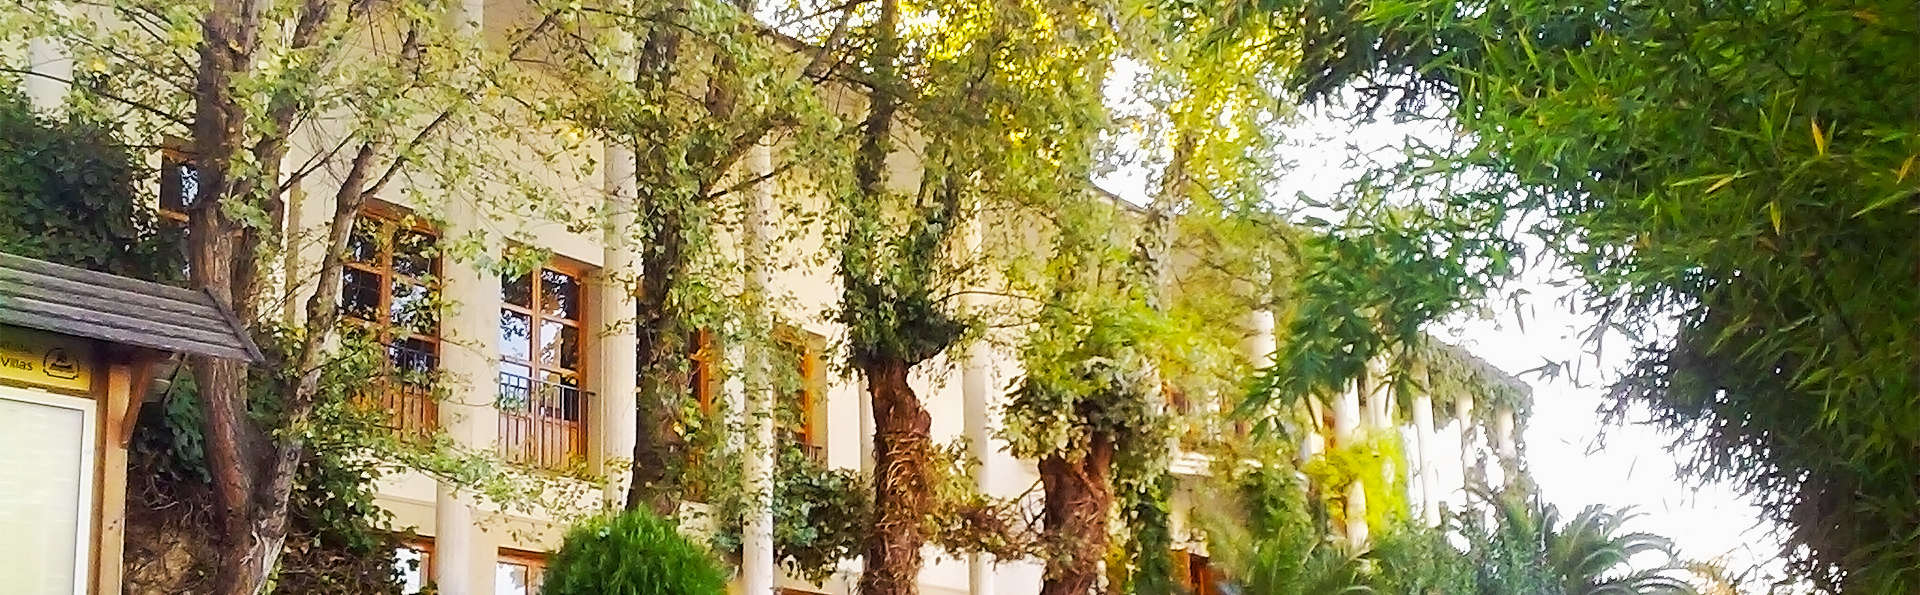 Hotel Villa de Cazorla - EDIT_2_fachada.jpg